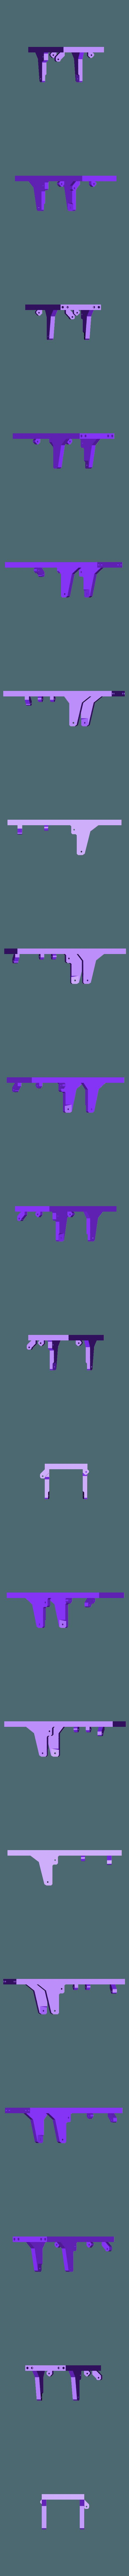 TruckV3_Frontframe1.STL Download STL file 3D Printed RC Truck V3 • 3D print model, MrCrankyface